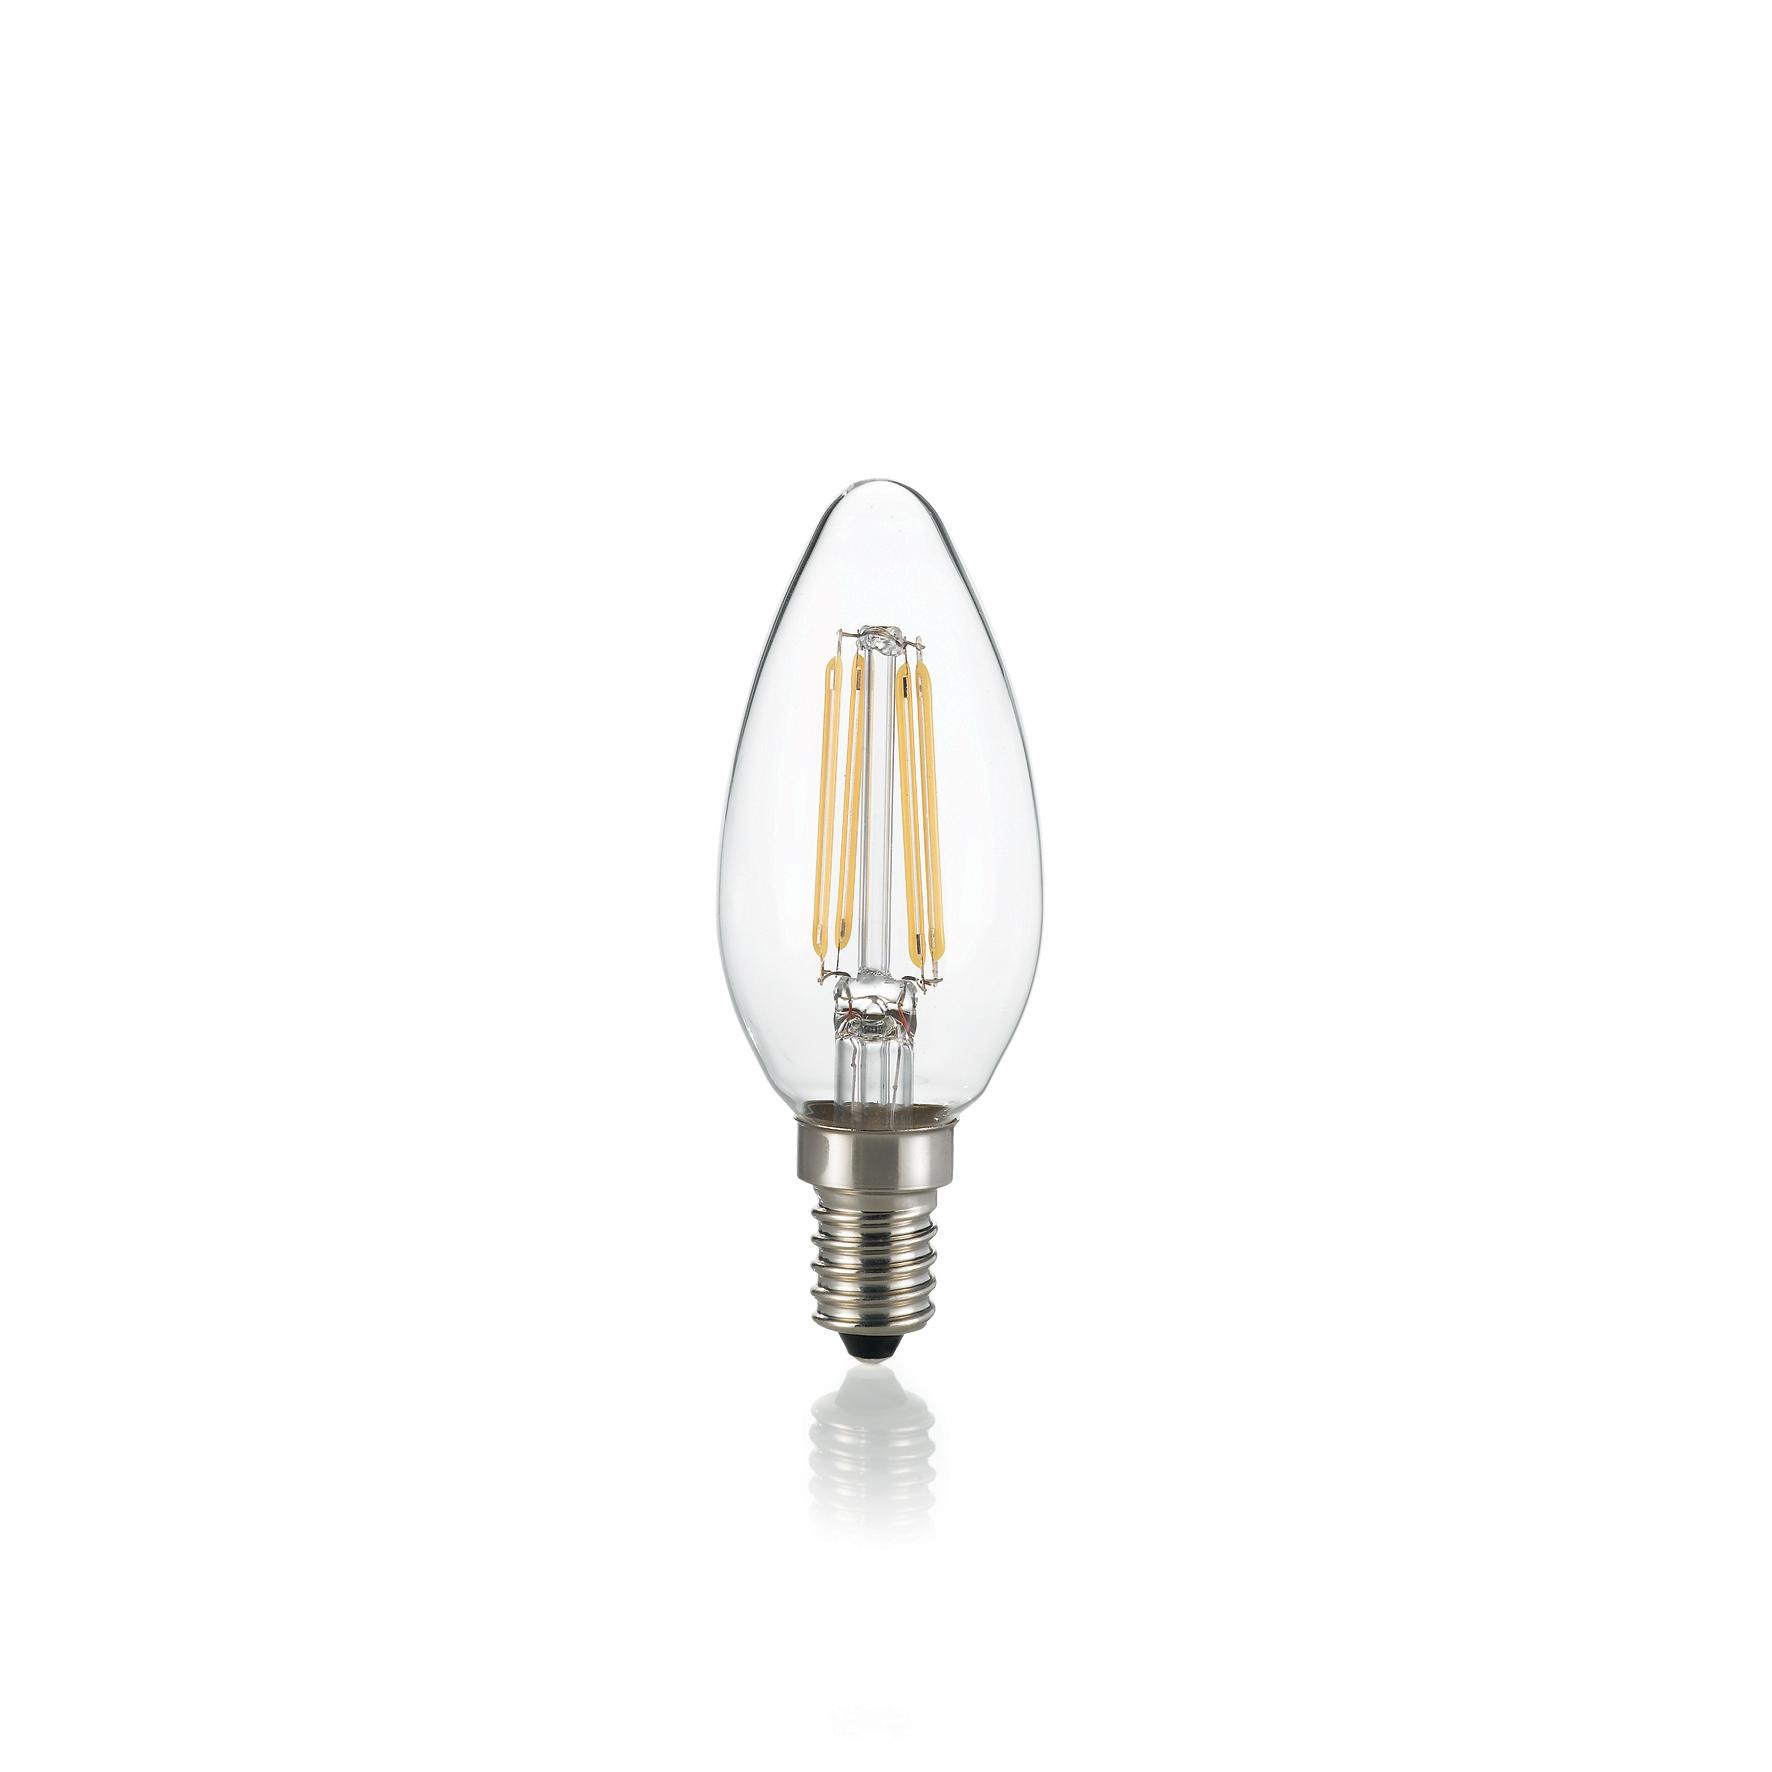 CLASSIC BULB - E14 OLIVE CLEAR